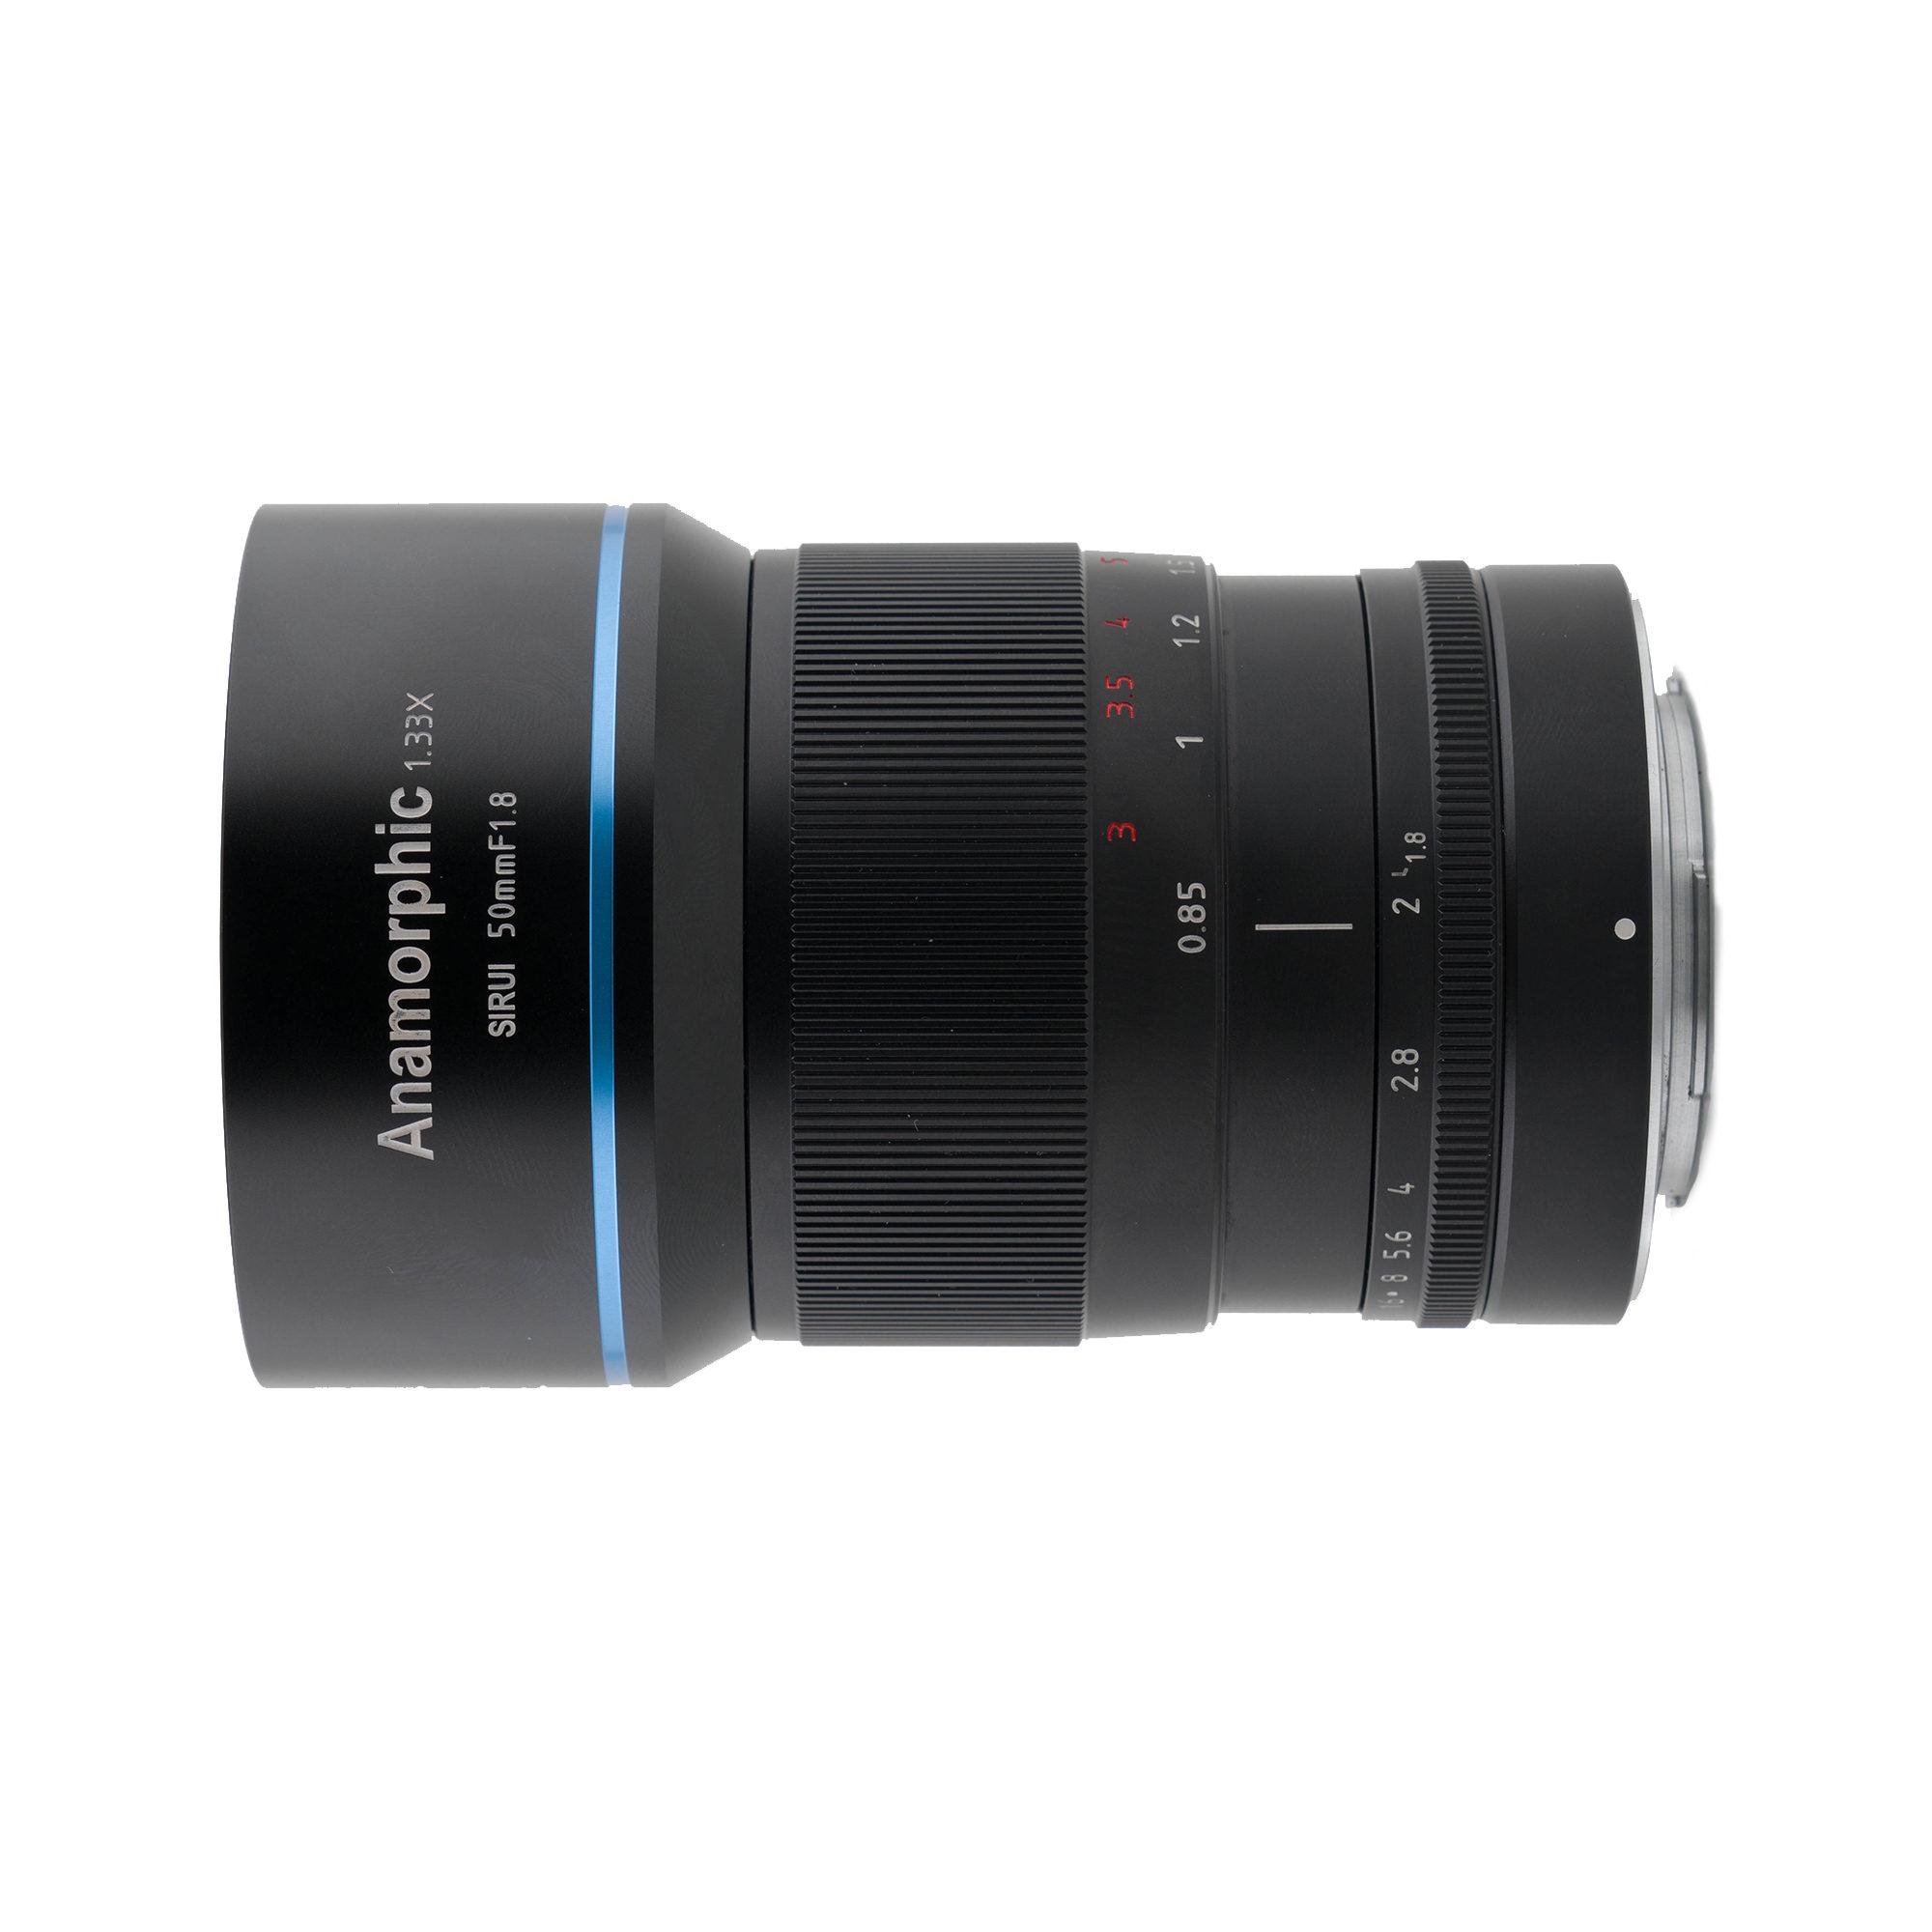 SIRUI ANAMORPHIQUE 50mm F1.8 x1.33